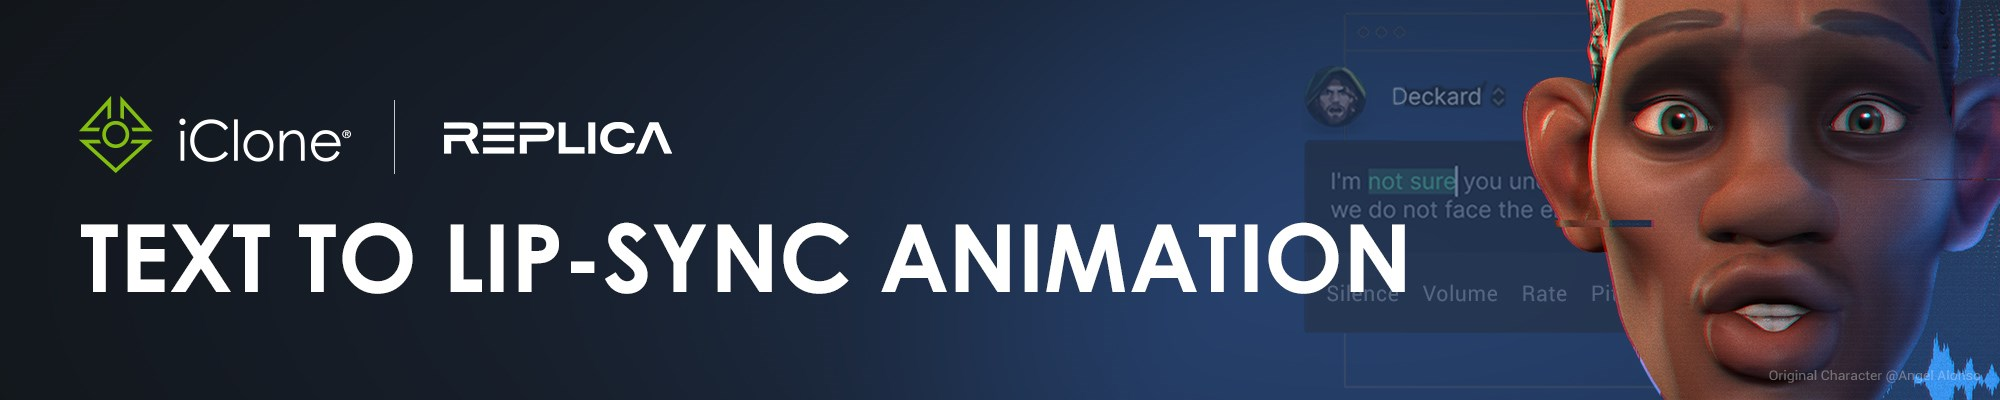 iClone & Replica Studios - Text to Lip-sync Animation